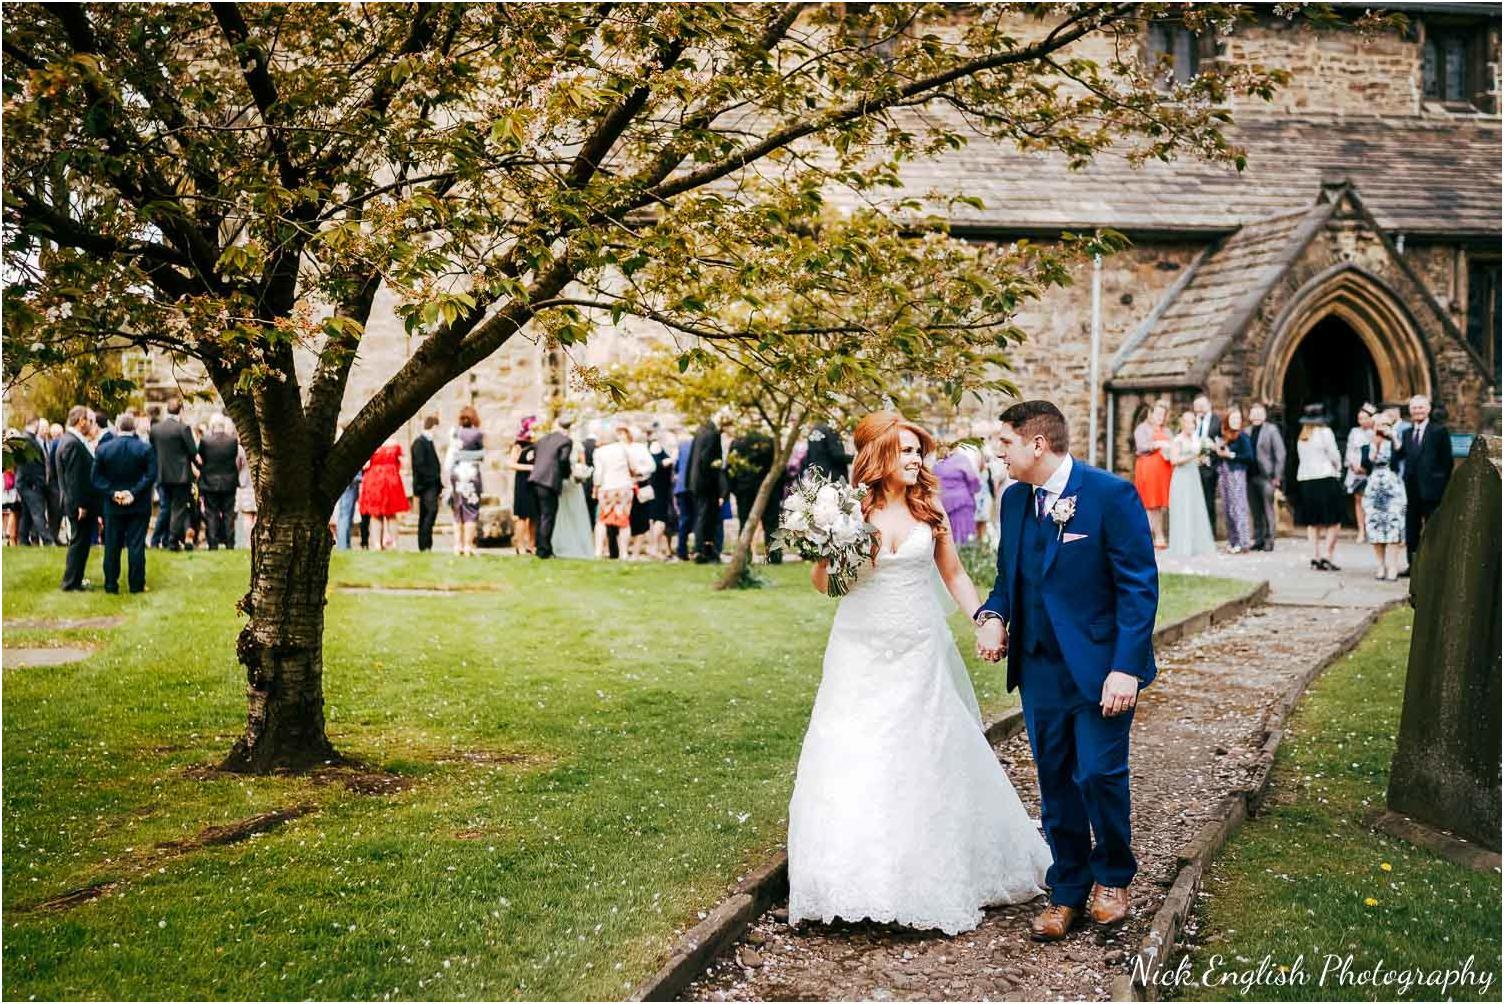 Mitton_Hall_Wedding_Photographer-85.jpg